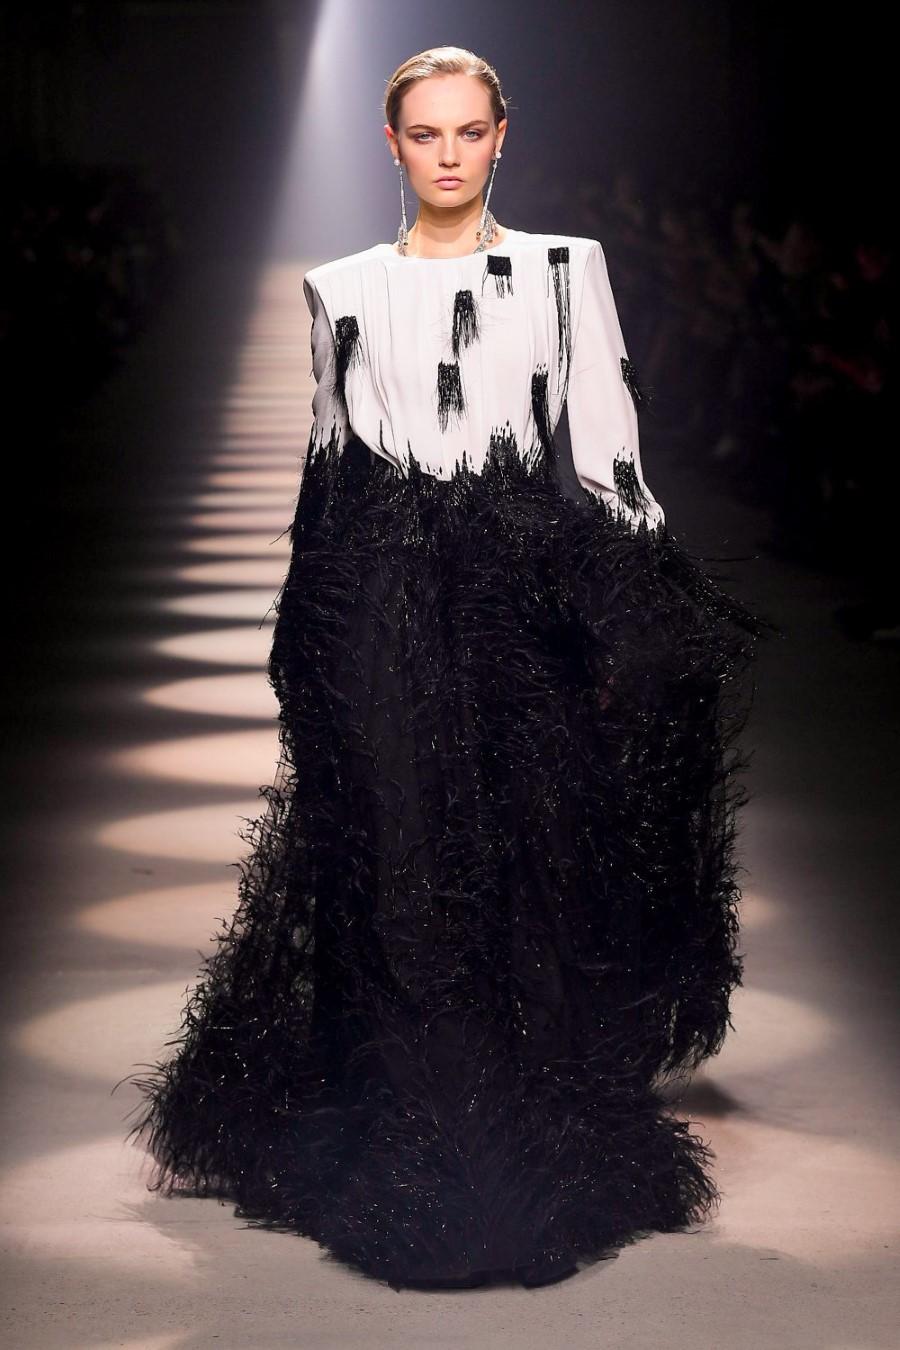 Givenchy - Fall Winter 2020 - Paris Fashion Week